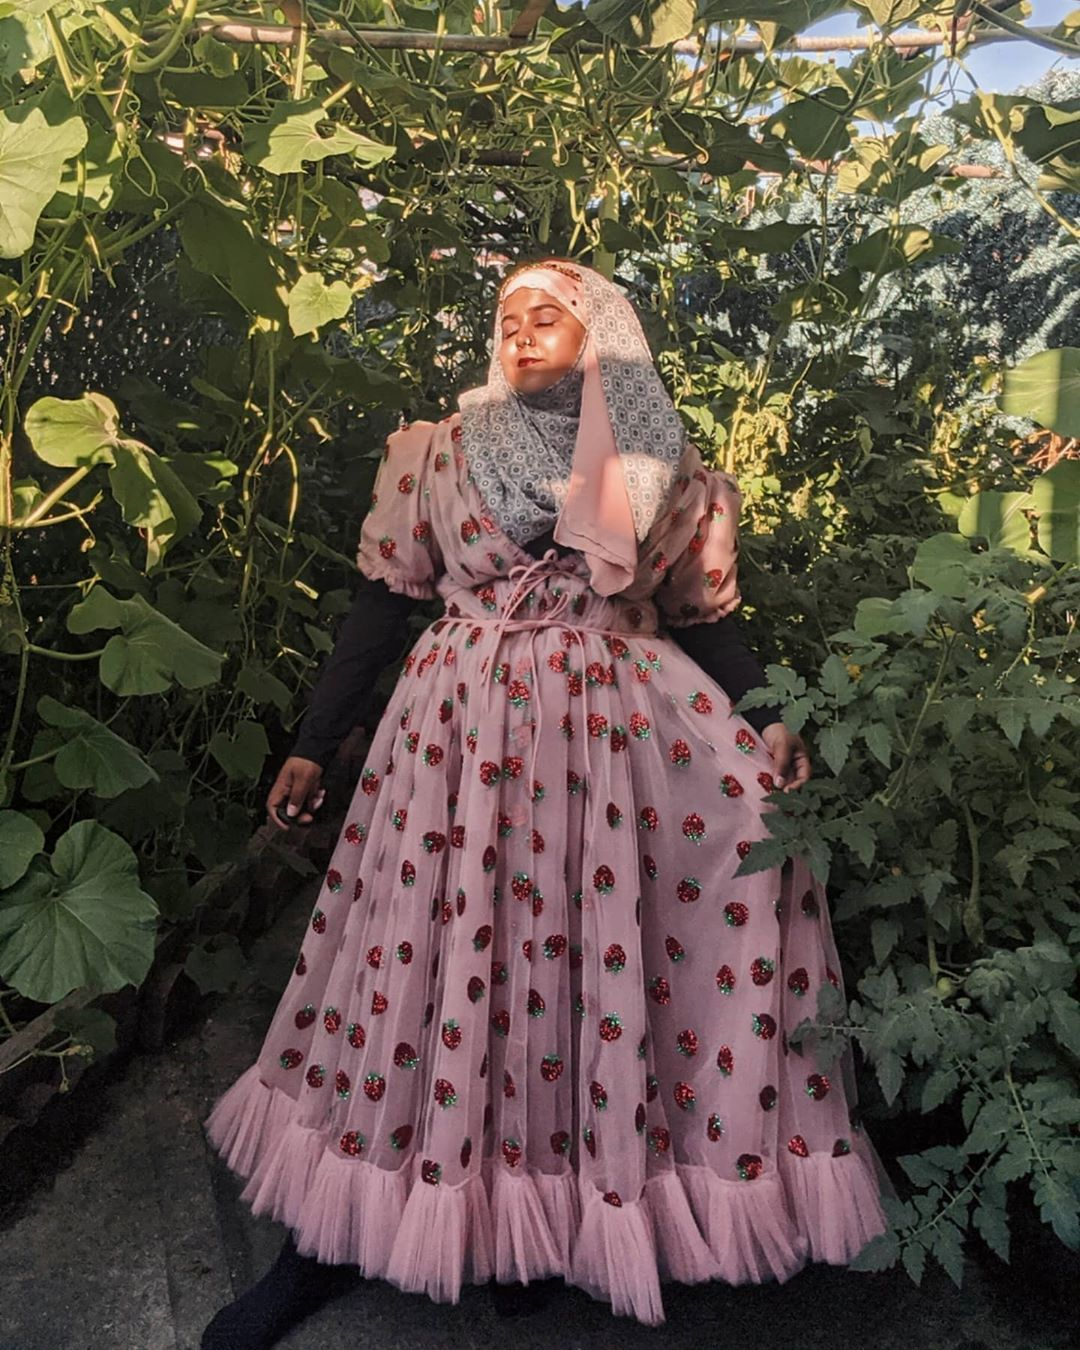 Lirika Matoshi S Strawberry Midi Dress Is Making Waves On Social Media Thanks In Part To The Rise Of Tiktok S Co Victorian Dress Fashion Cottagecore Aesthetic [ 1350 x 1080 Pixel ]